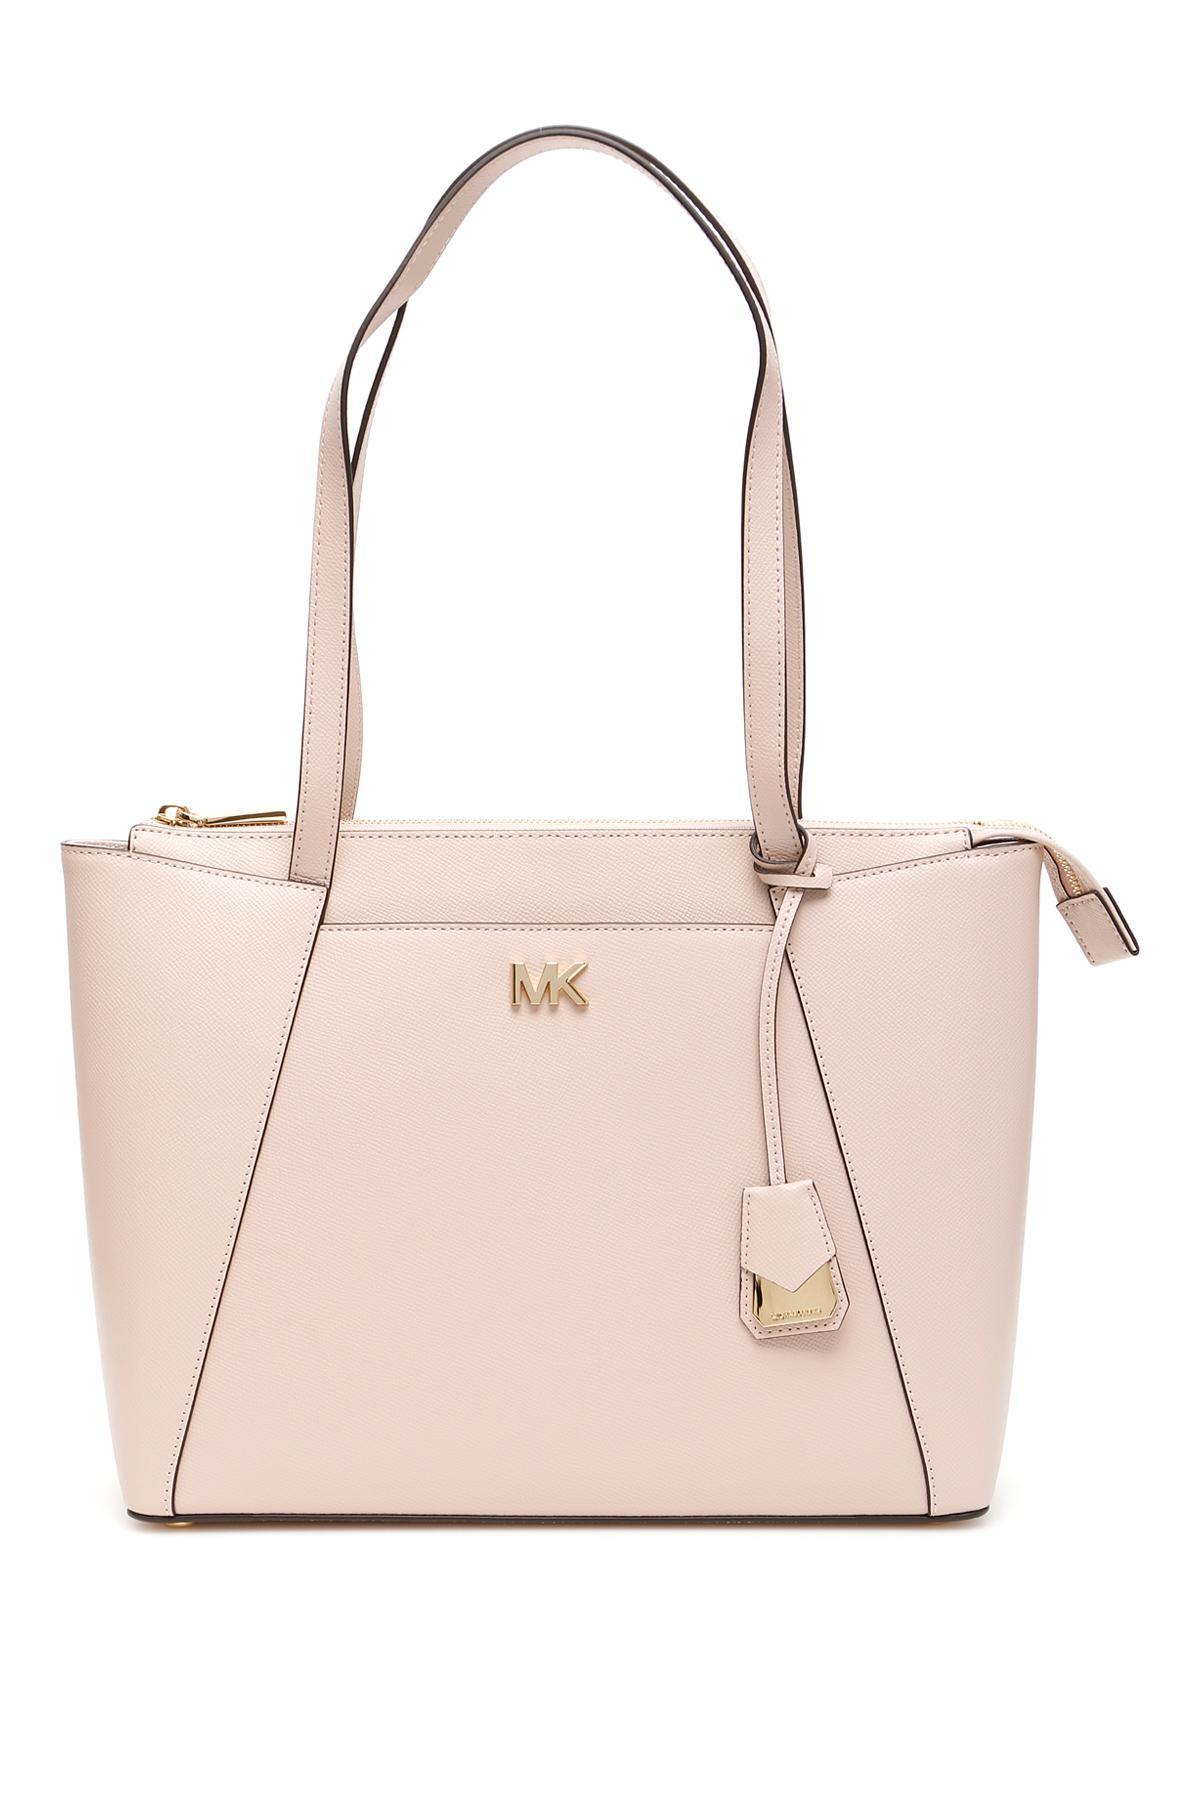 2ce0dbaab2 Lyst - MICHAEL Michael Kors Maddie Tote Bag in Pink